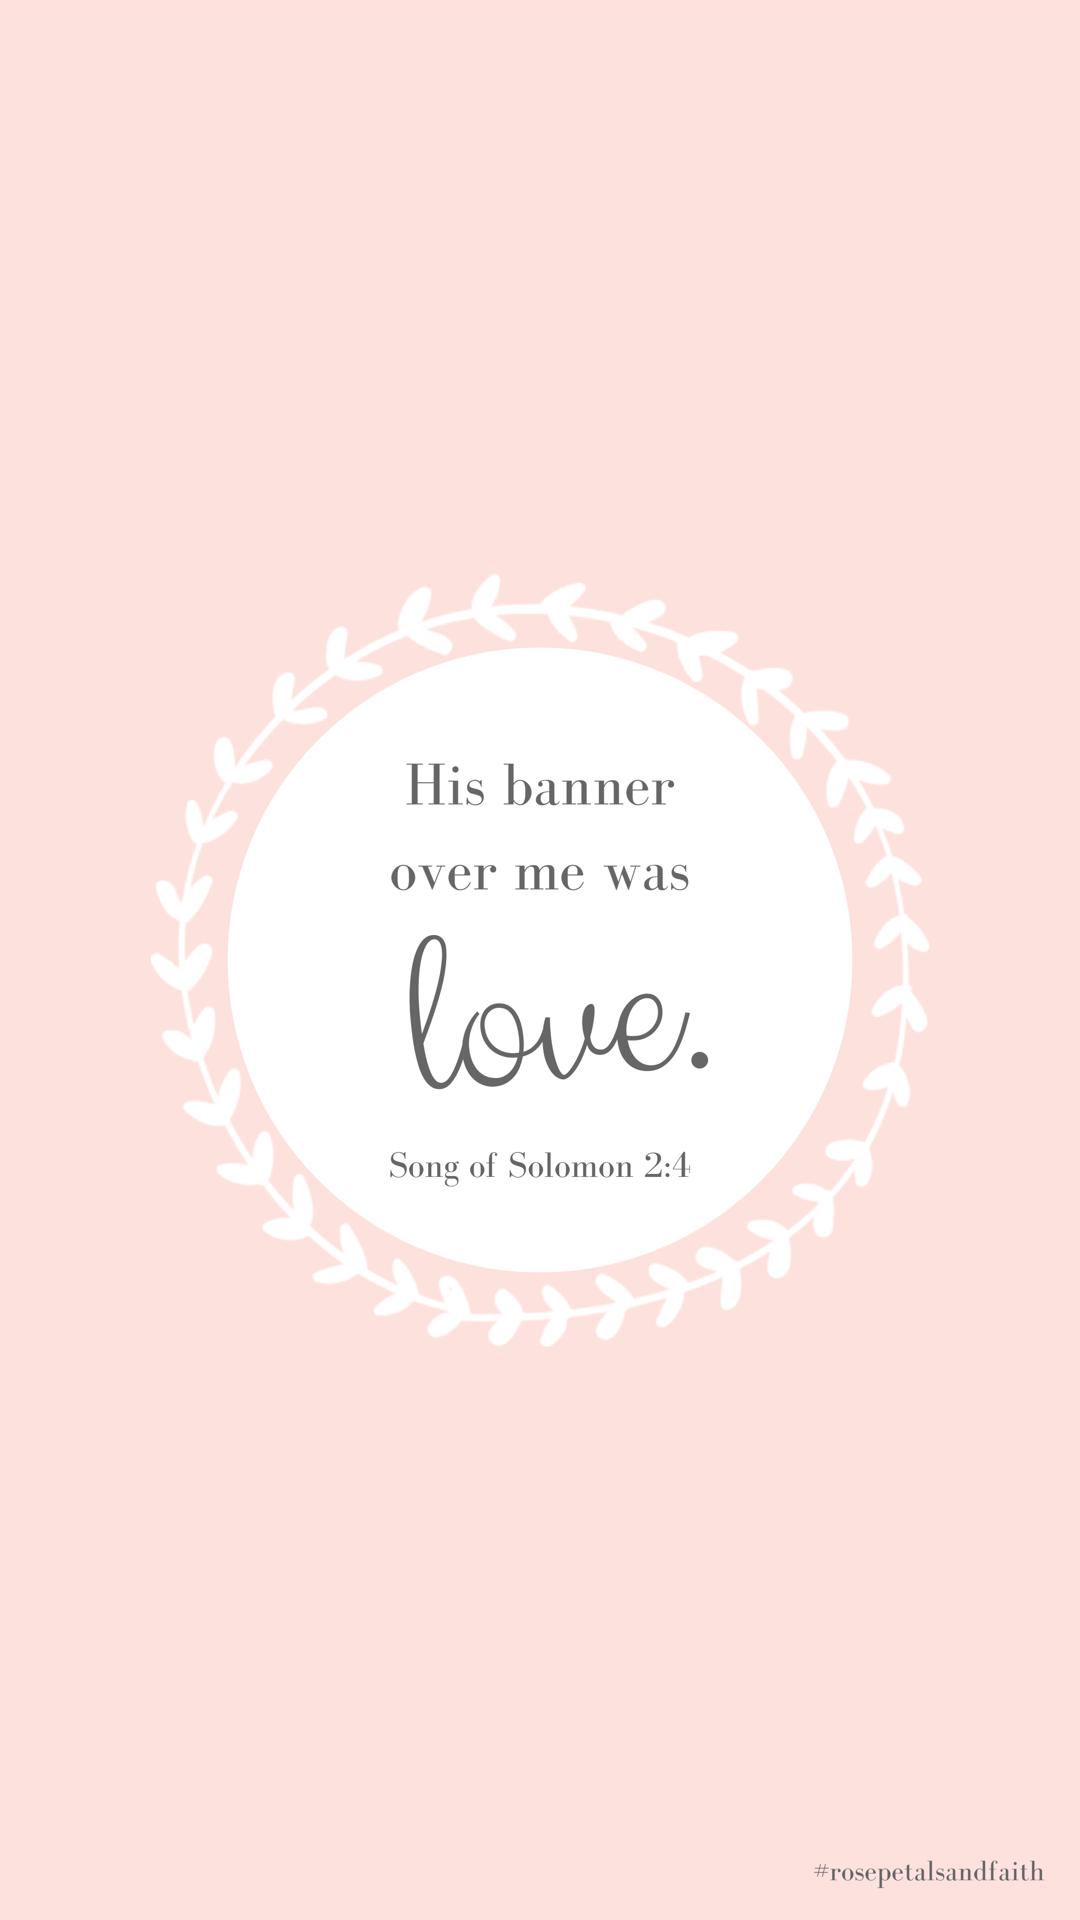 Cute Christian Wallpapers   Top Cute Christian Backgrounds 1080x1920